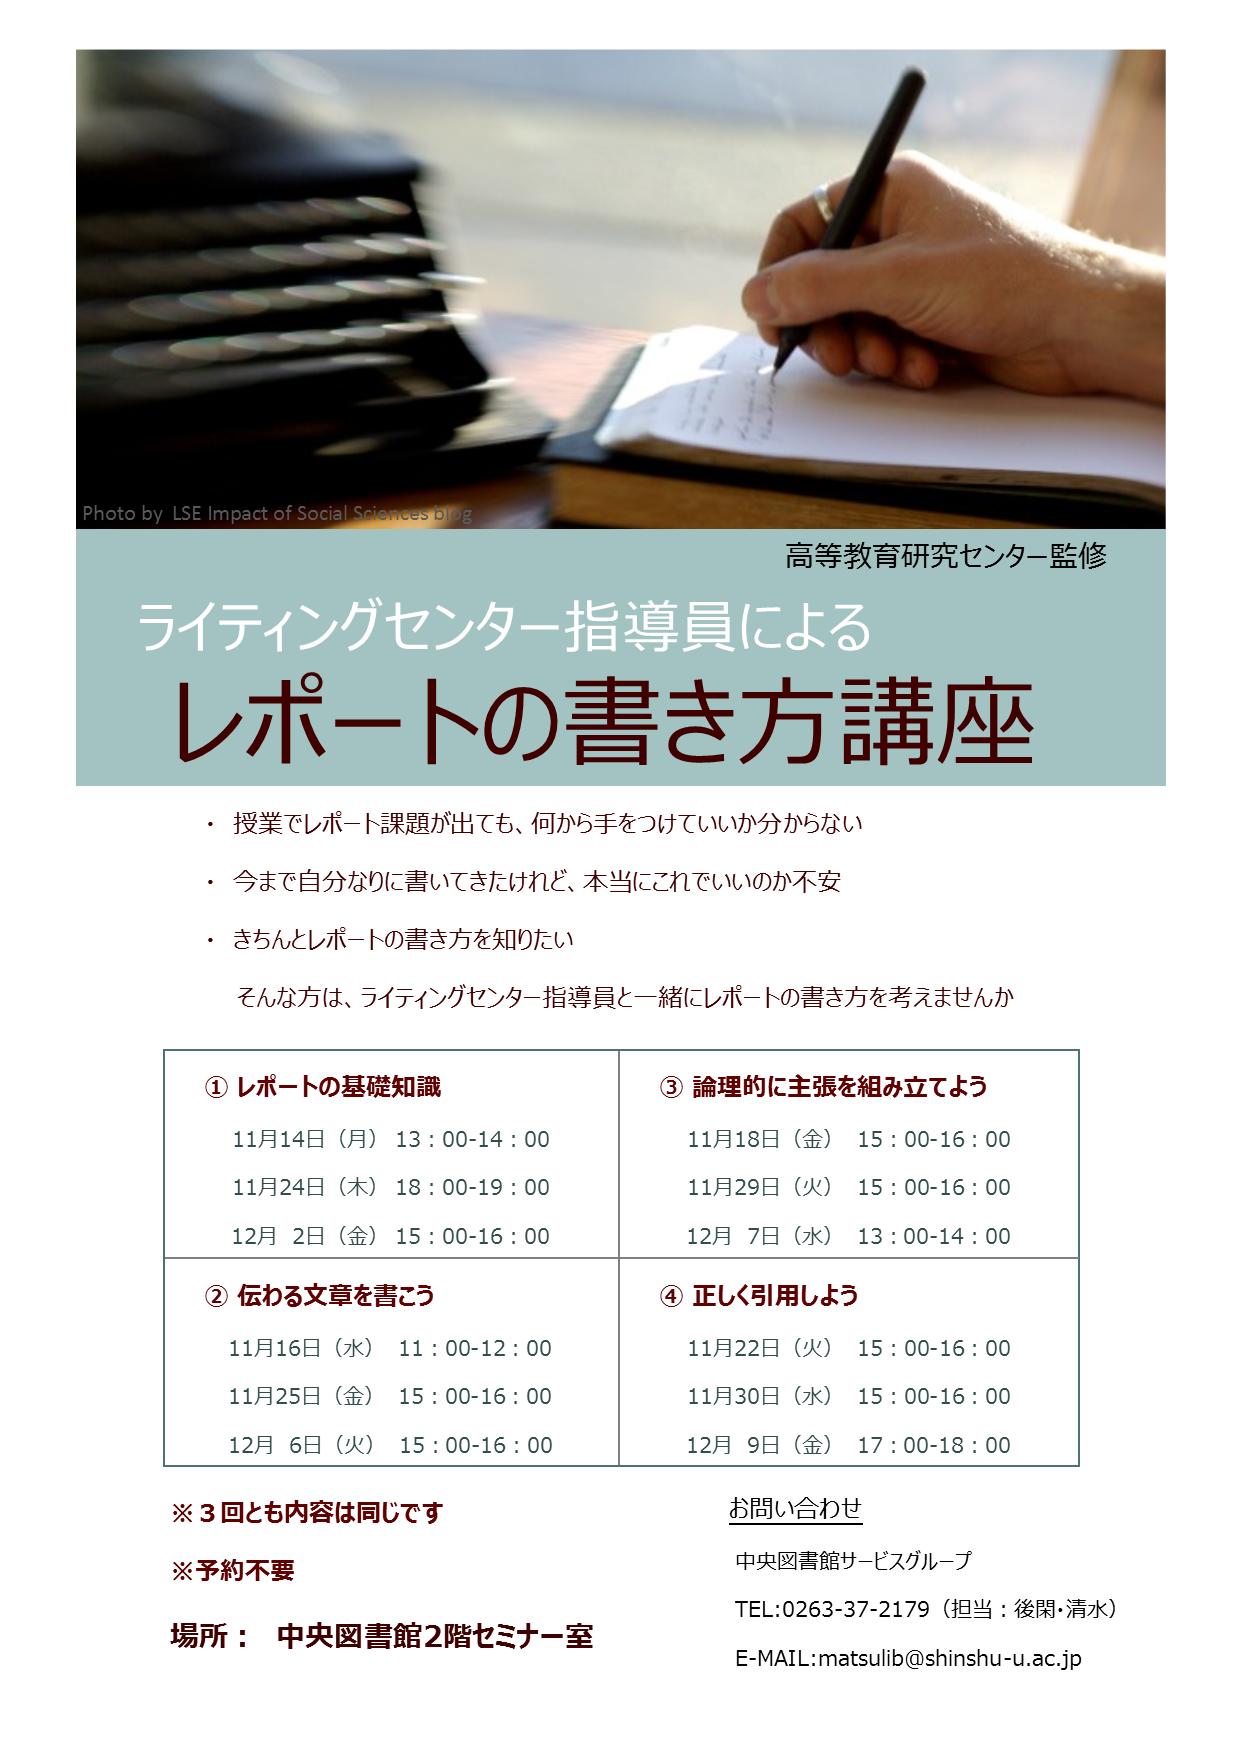 http://www.shinshu-u.ac.jp/institution/library/matsumoto/uploadimg/5775de9e6f63e996a8f976de82a2a35a.png